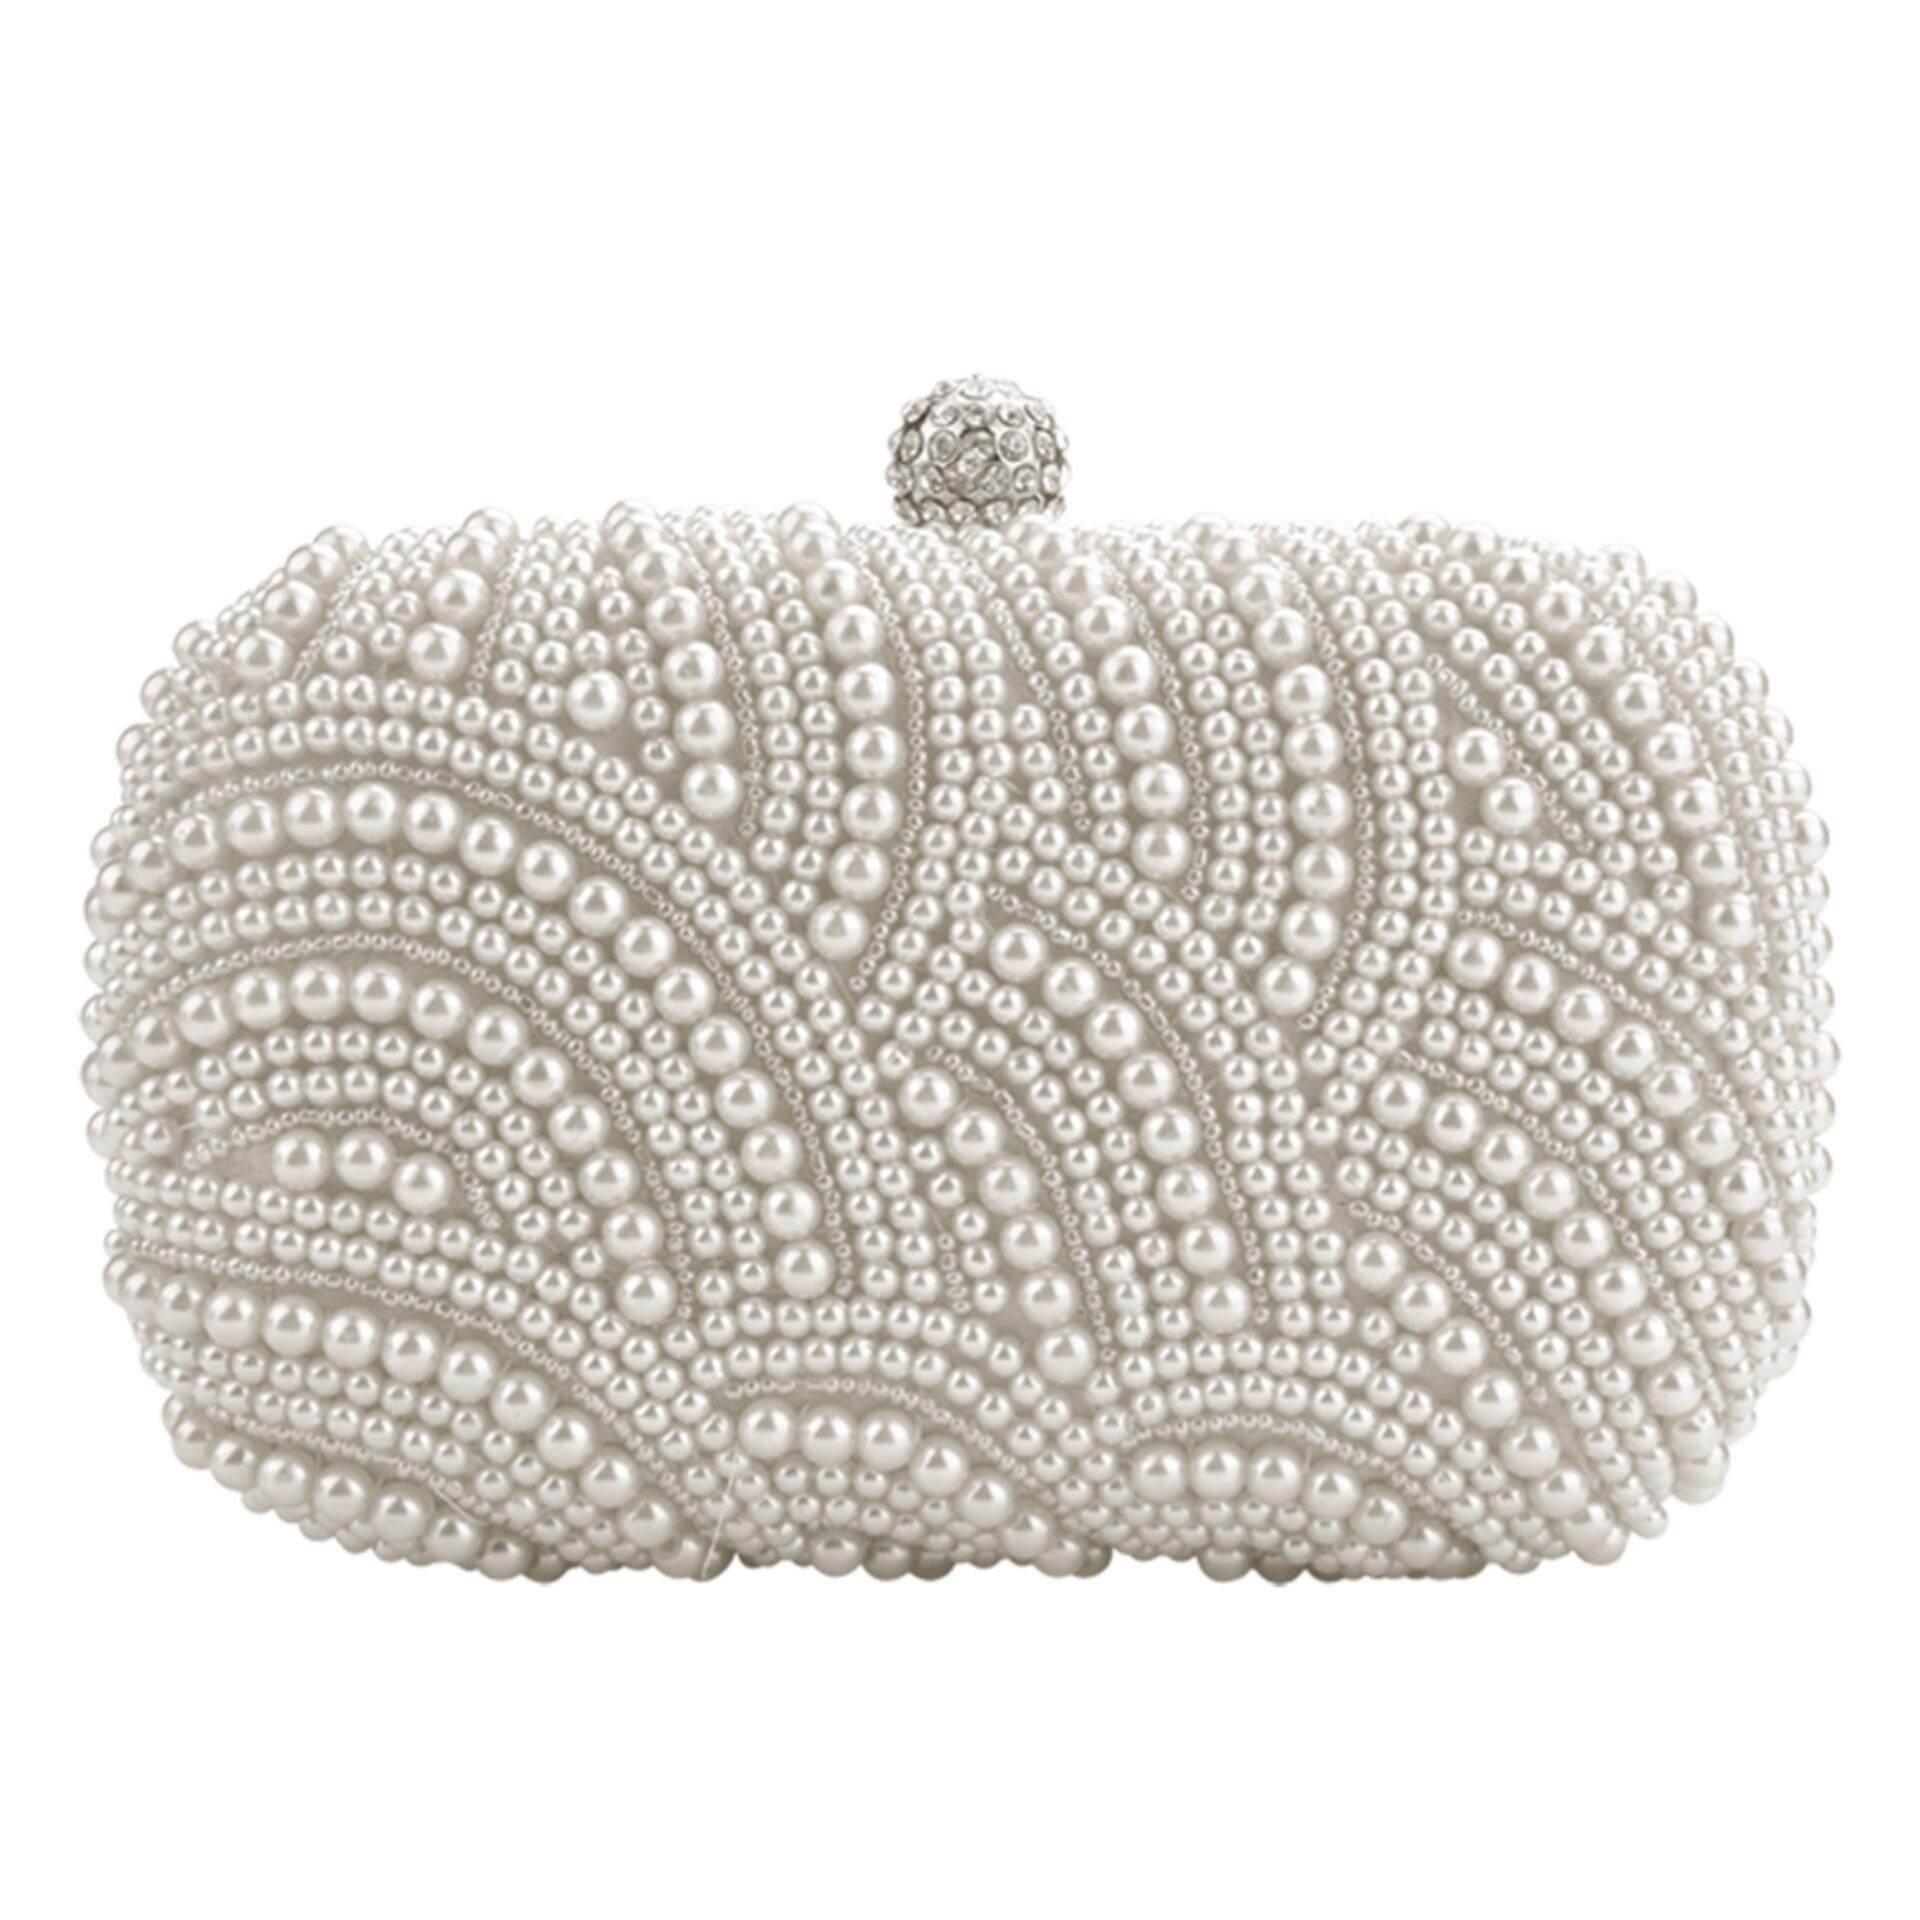 Women Party Bridal Clutch Bag Pearl Beaded Handbag Wedding Evening Purse White - intl